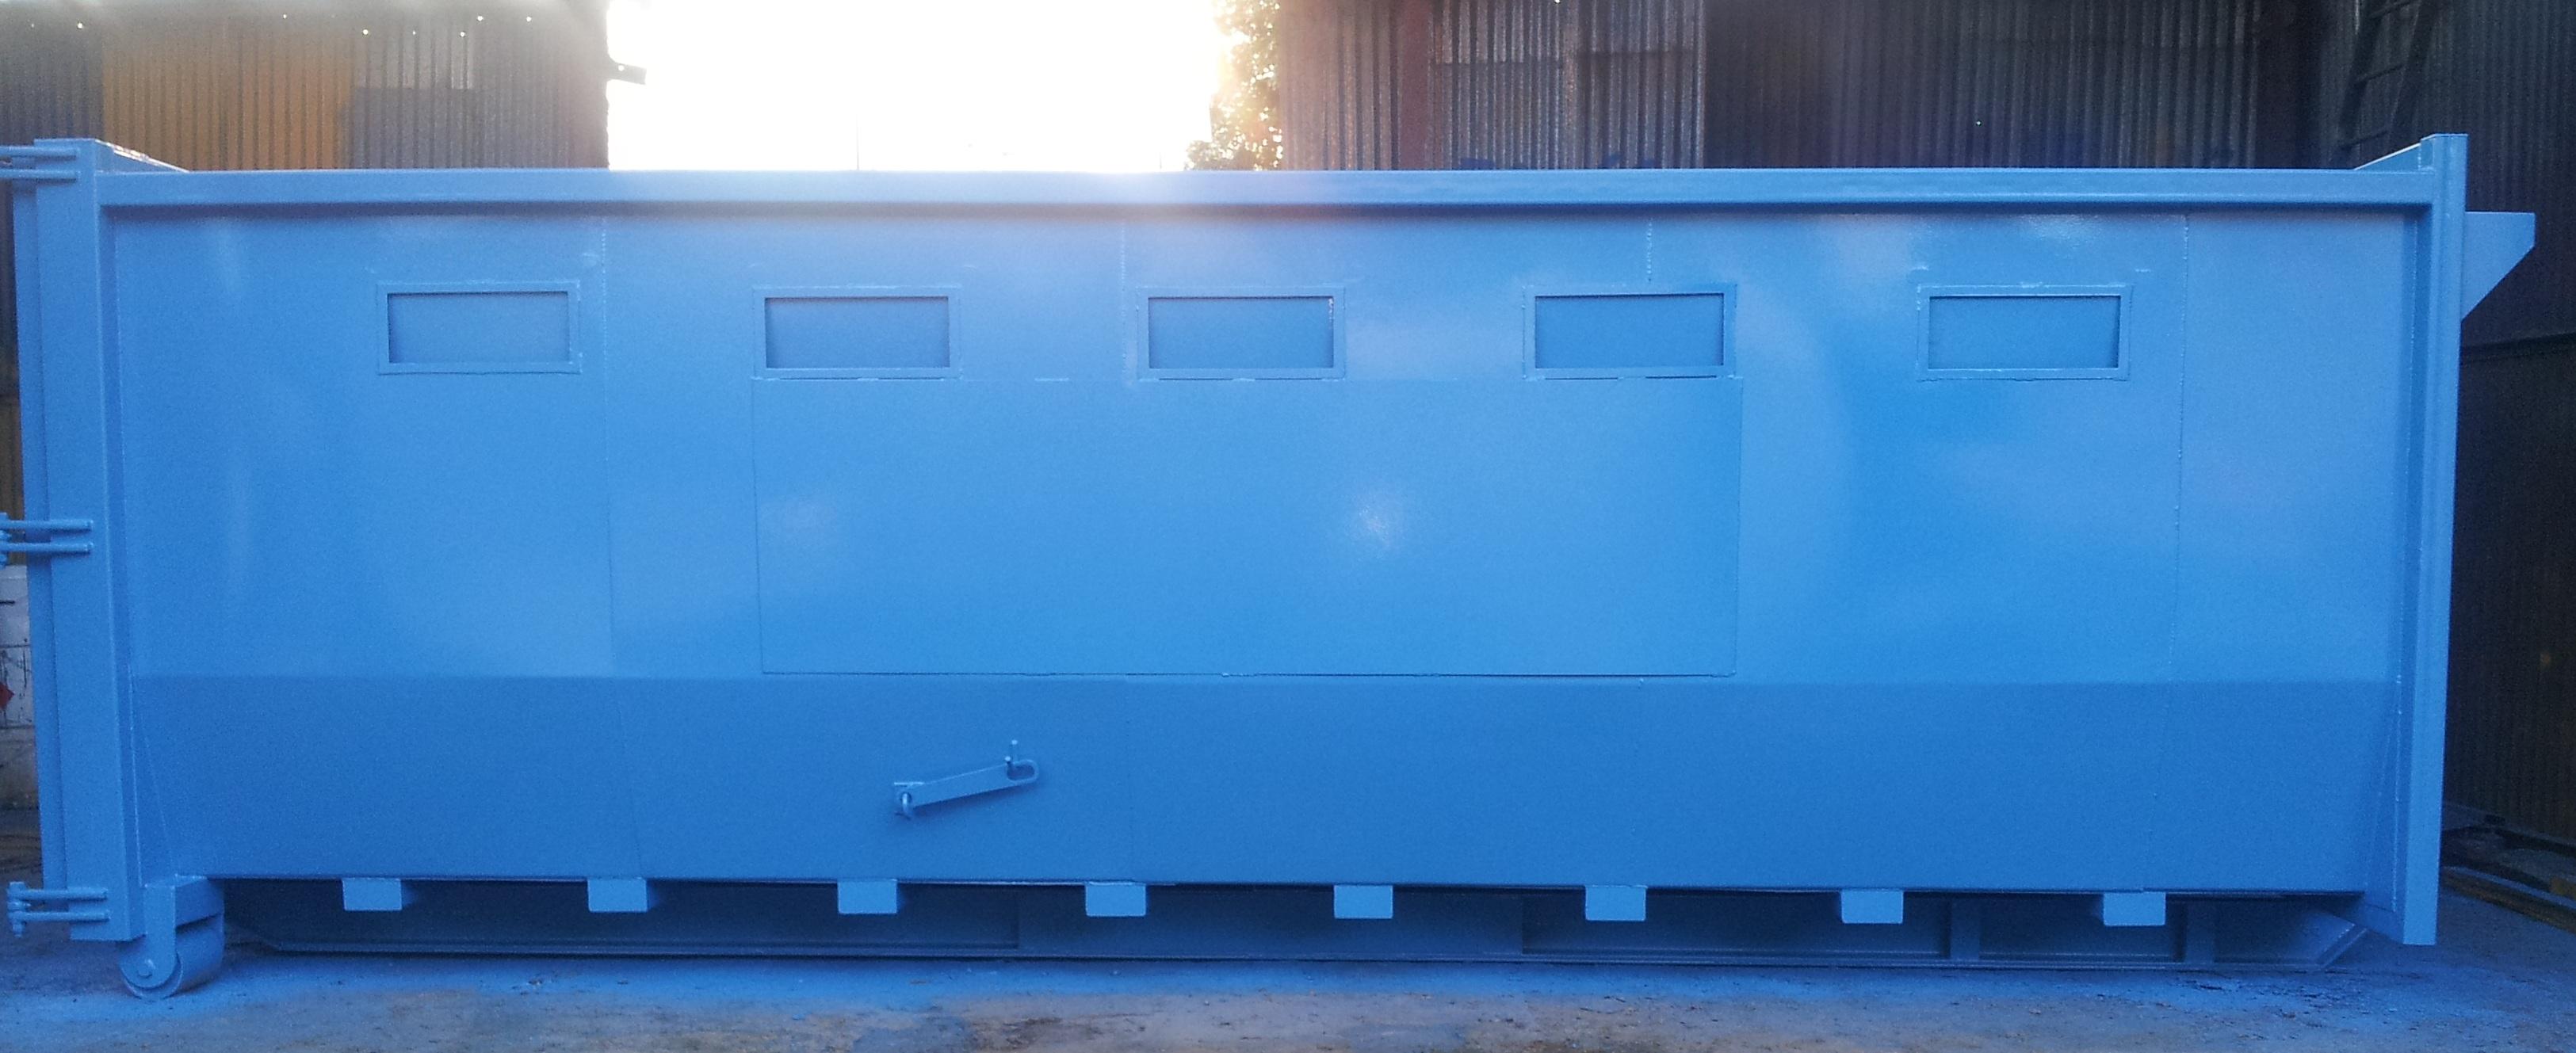 30 yard recycling bank